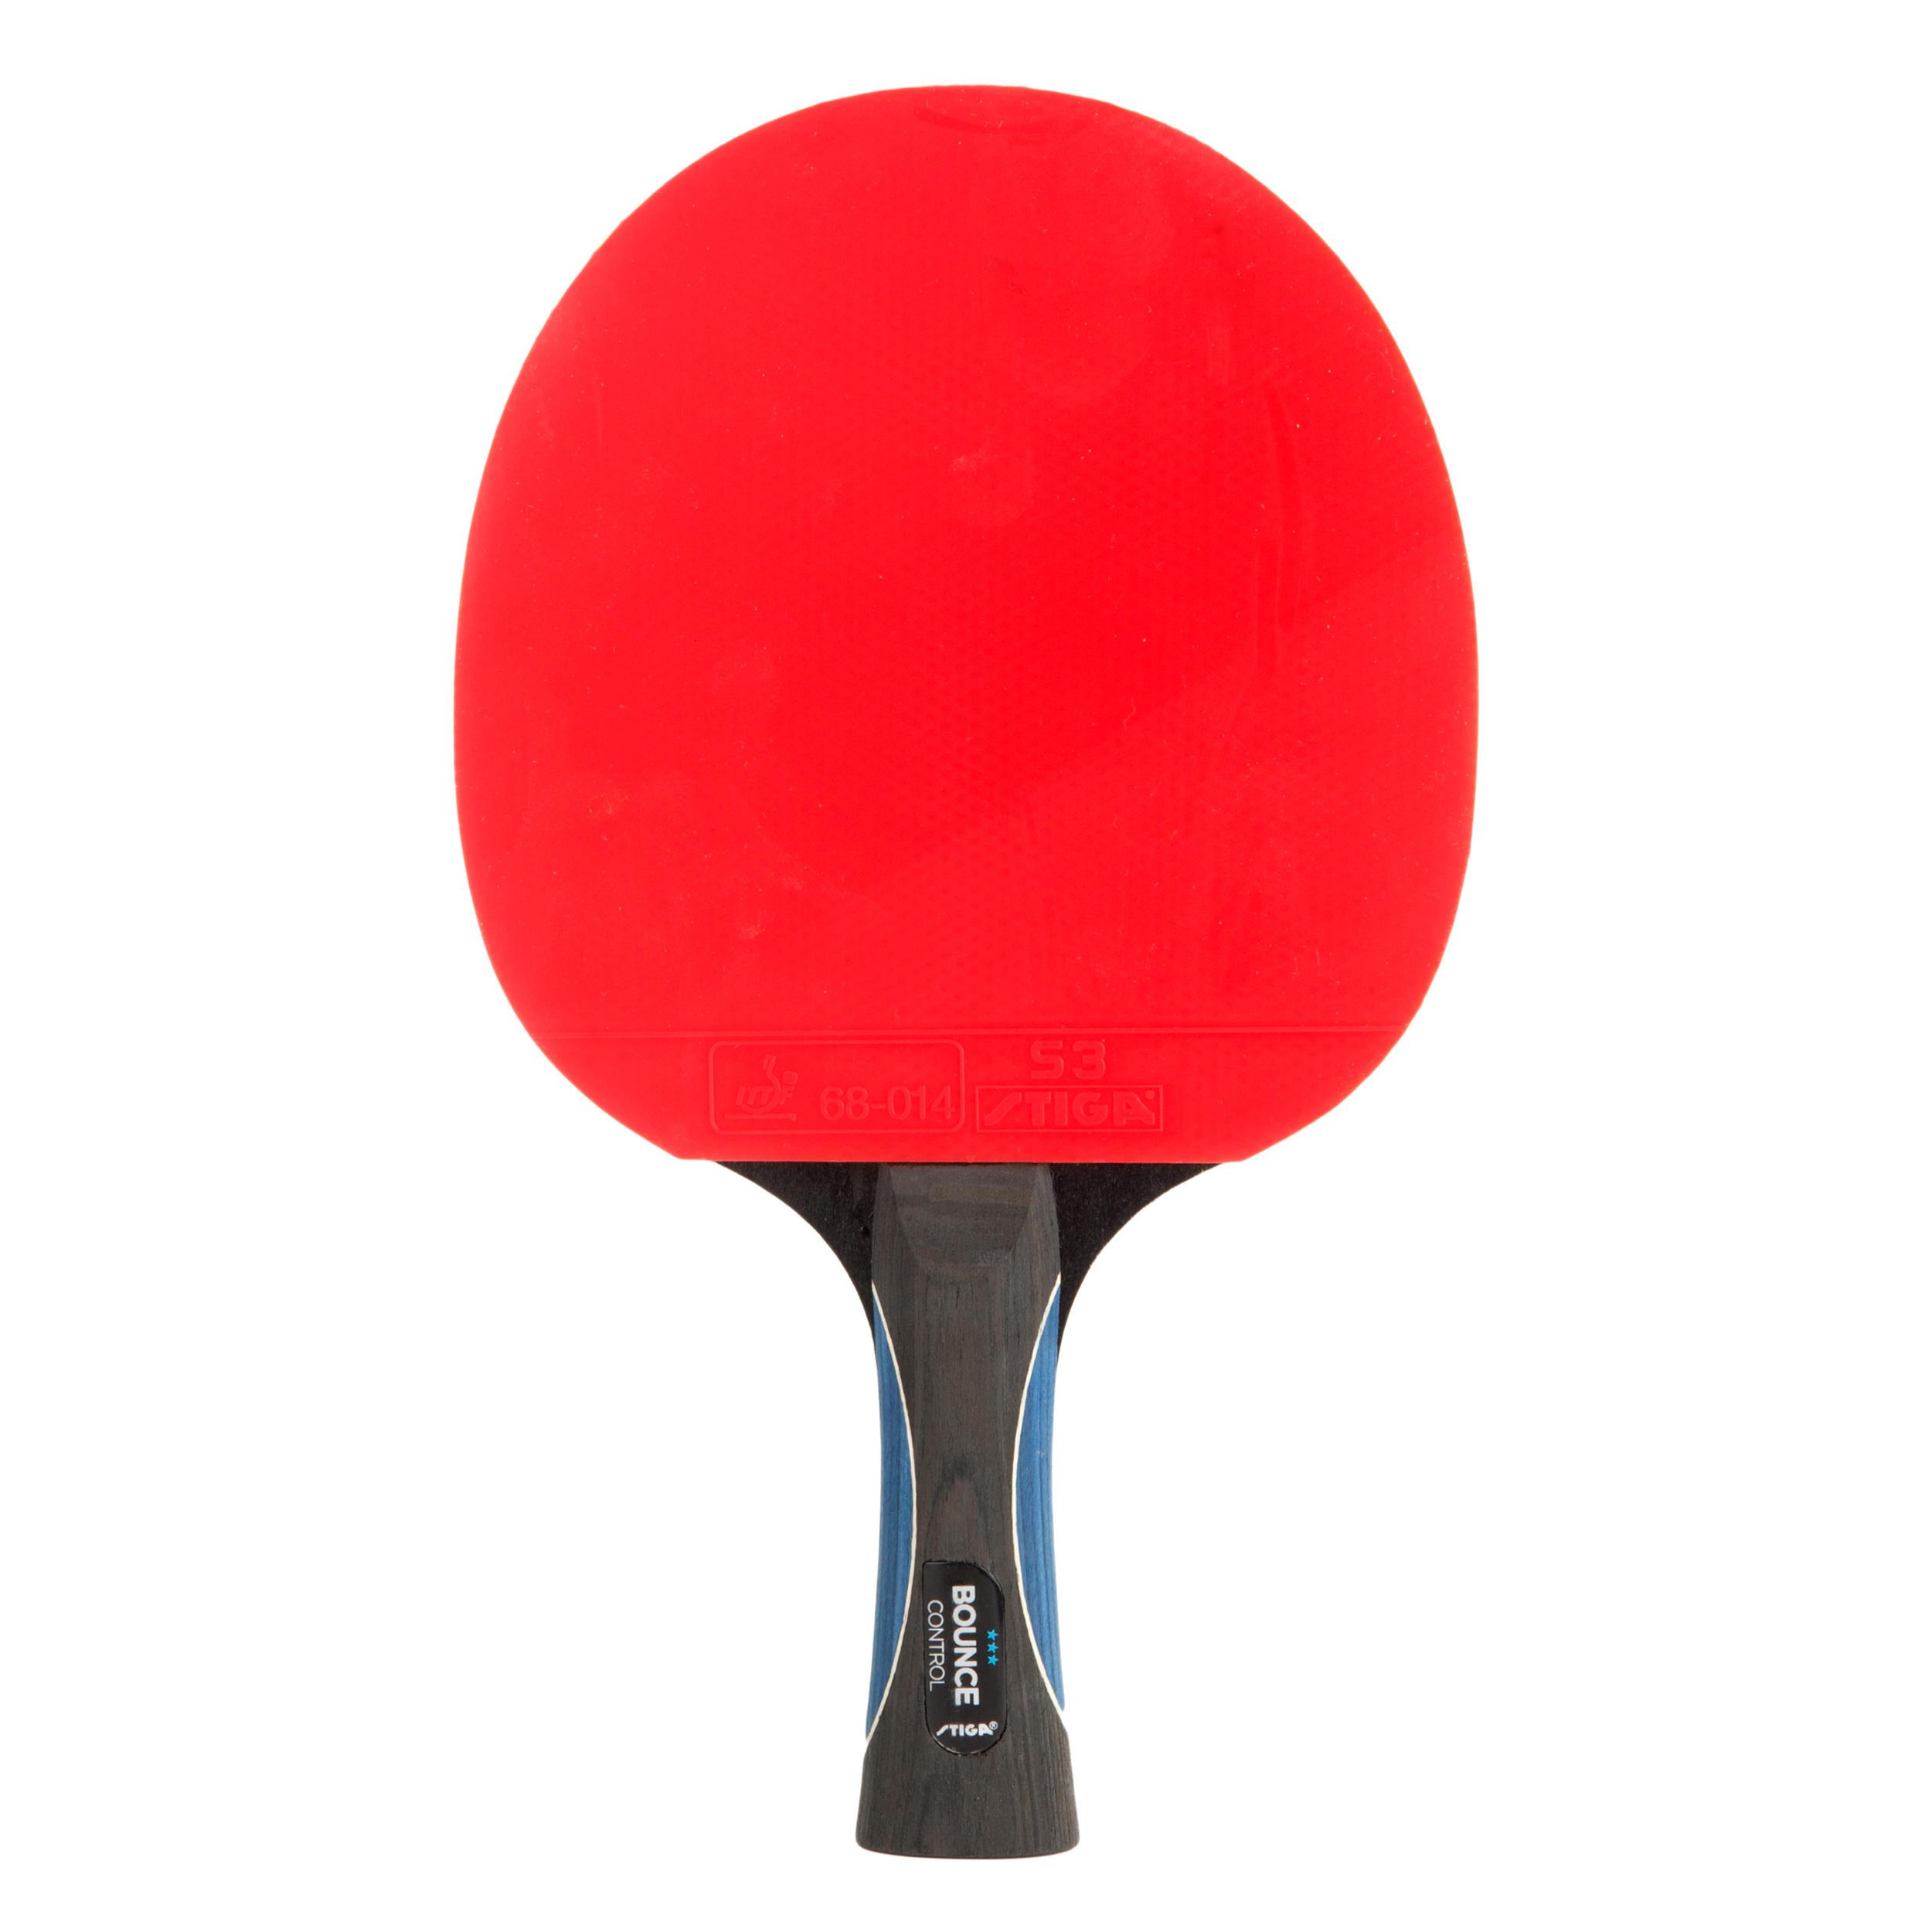 Stiga raquette de tennis de table indoor stiga bounce - Raquette de tennis de table decathlon ...